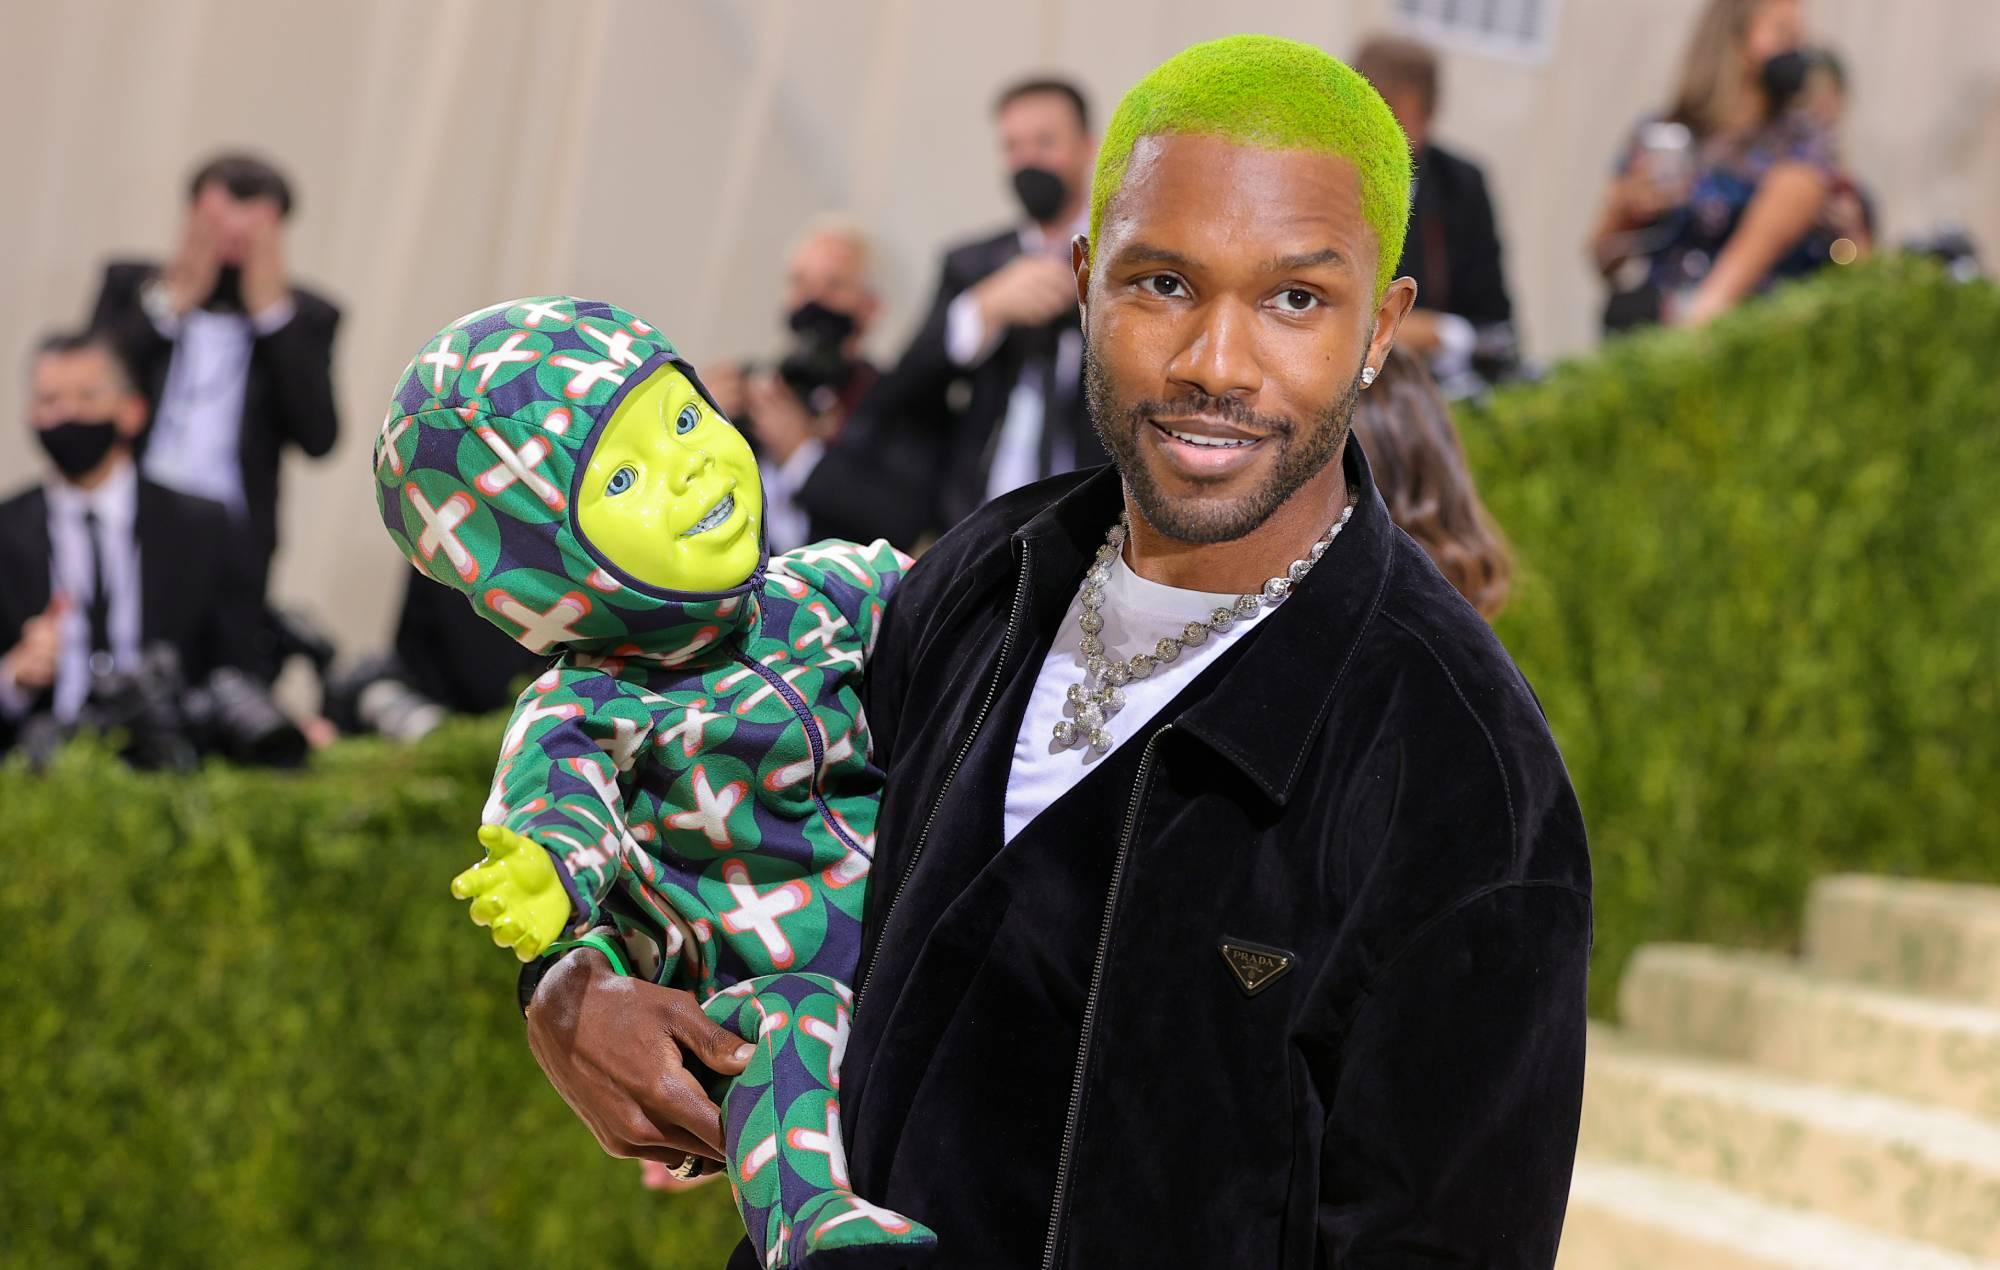 Frank Ocean brought a neon green robot baby to the Met Gala